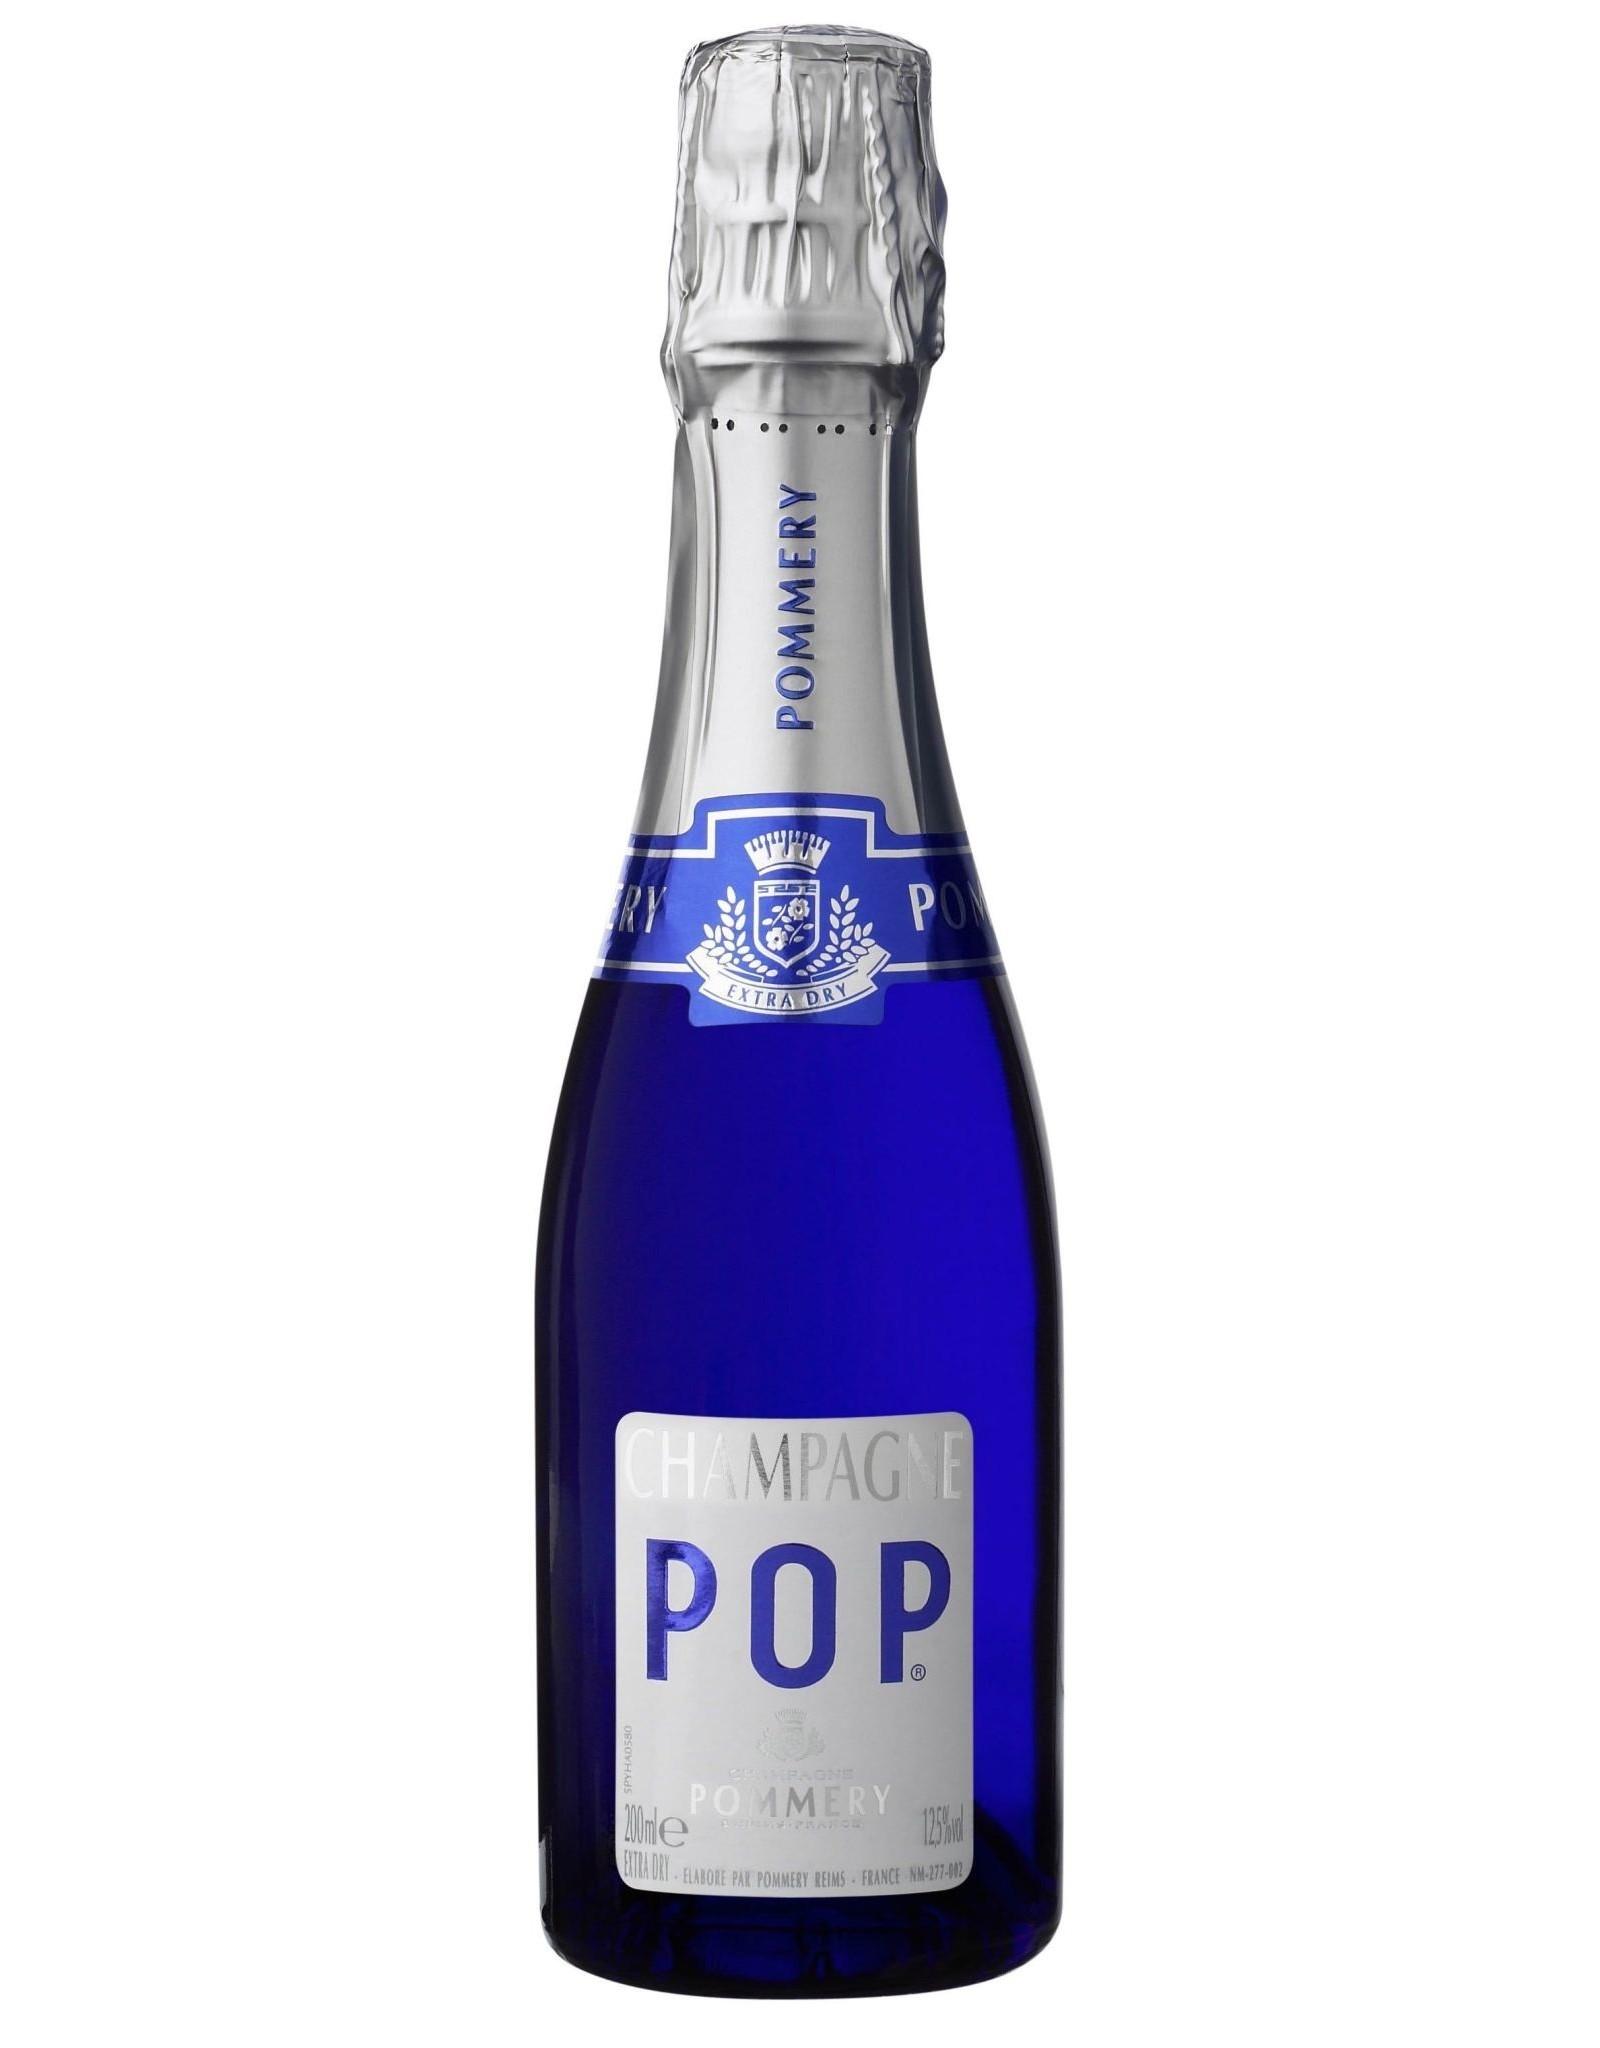 Pommery Extra Dry Champagne 187 ml bottle